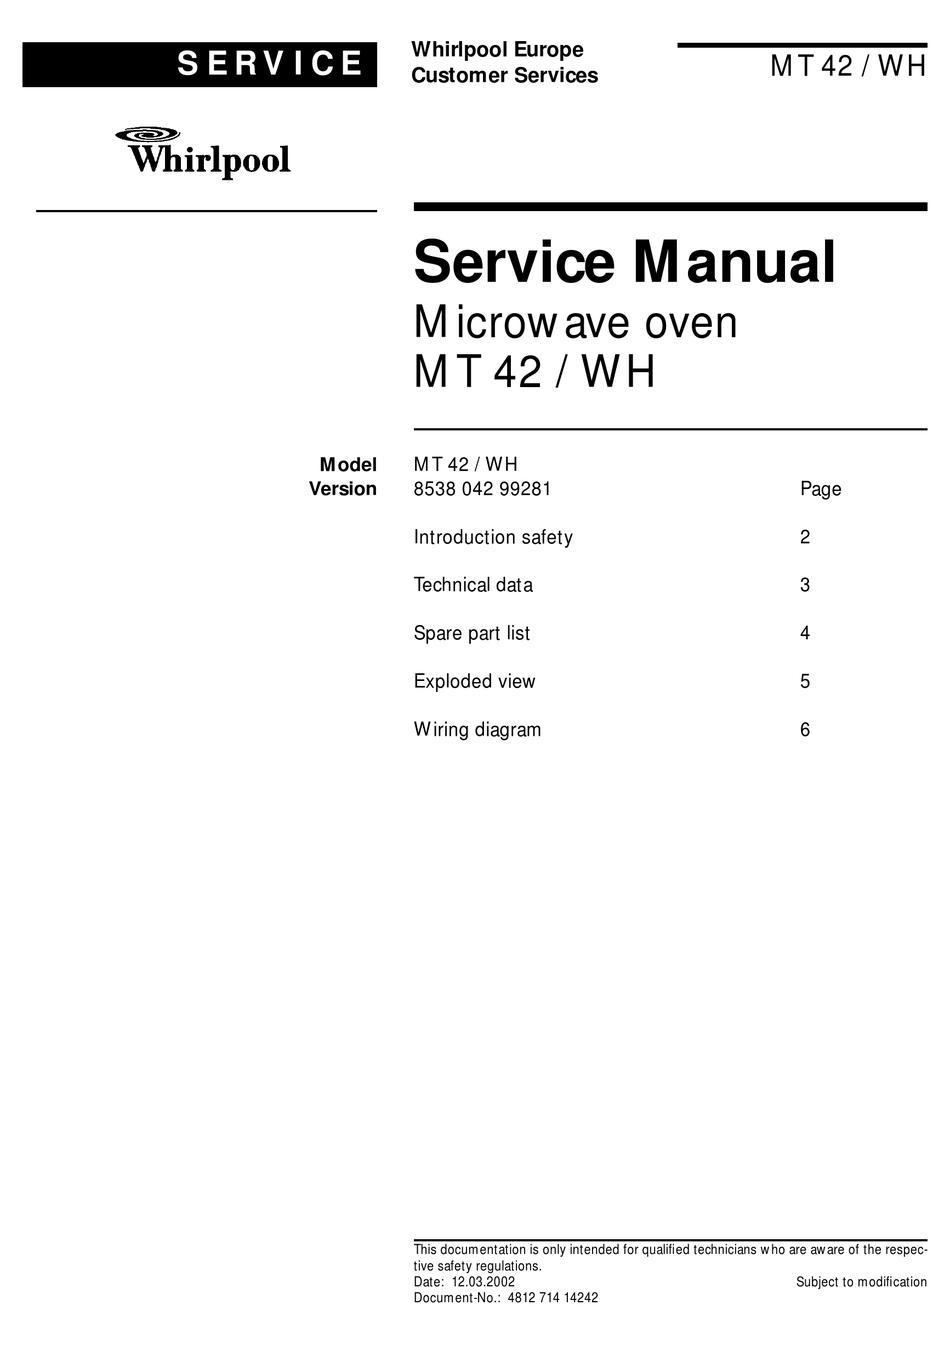 whirlpool mt 42 wh service manual pdf